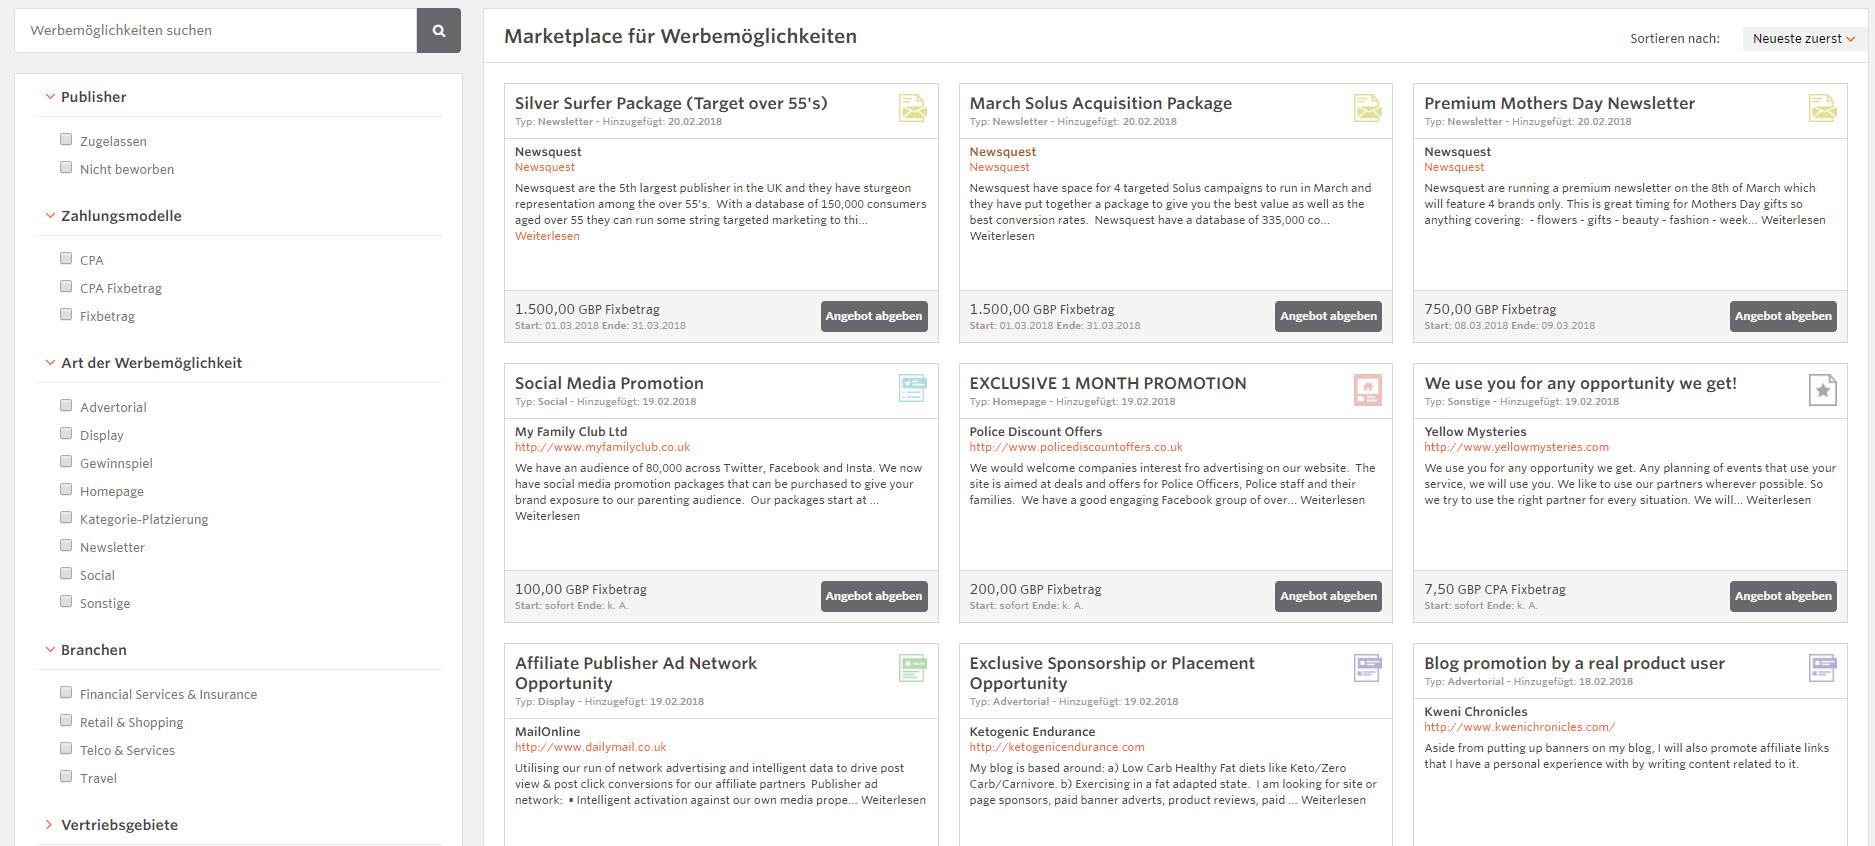 Screenshot vom Opportunity Marketplace